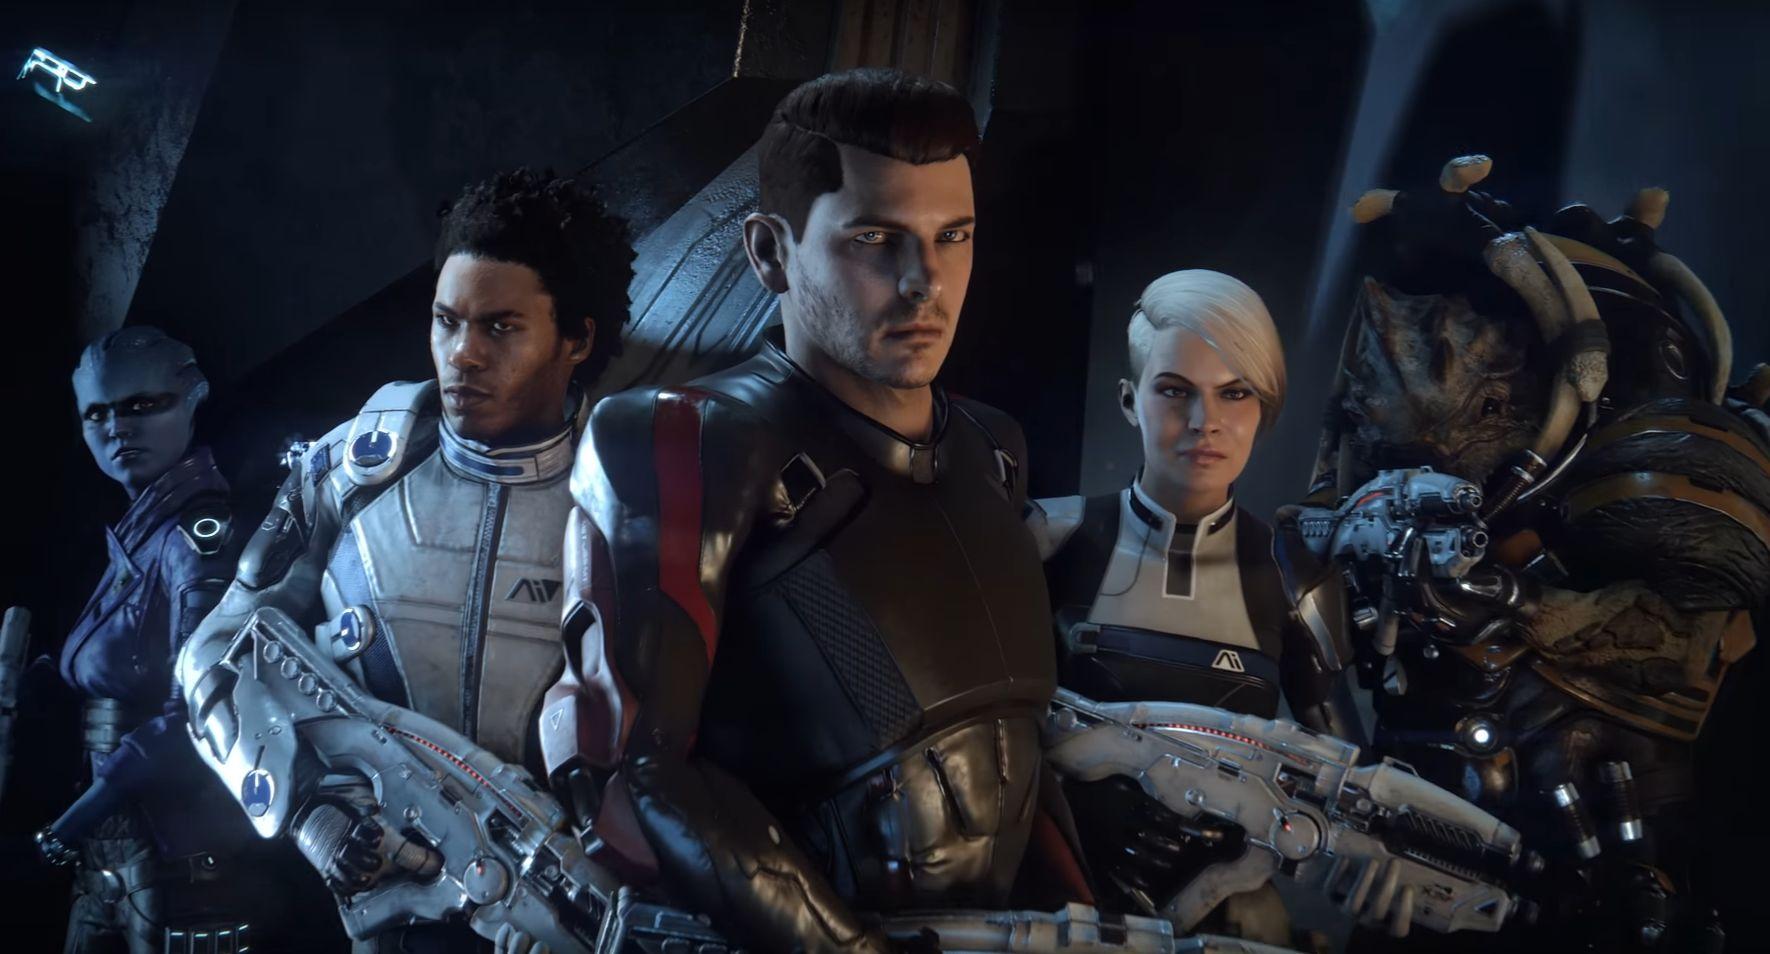 De gauche à droite : Peebee (asari), Liam (humain), Scott Ryder (pionnier humain), Vetra (humaine) et Drack (krogan)